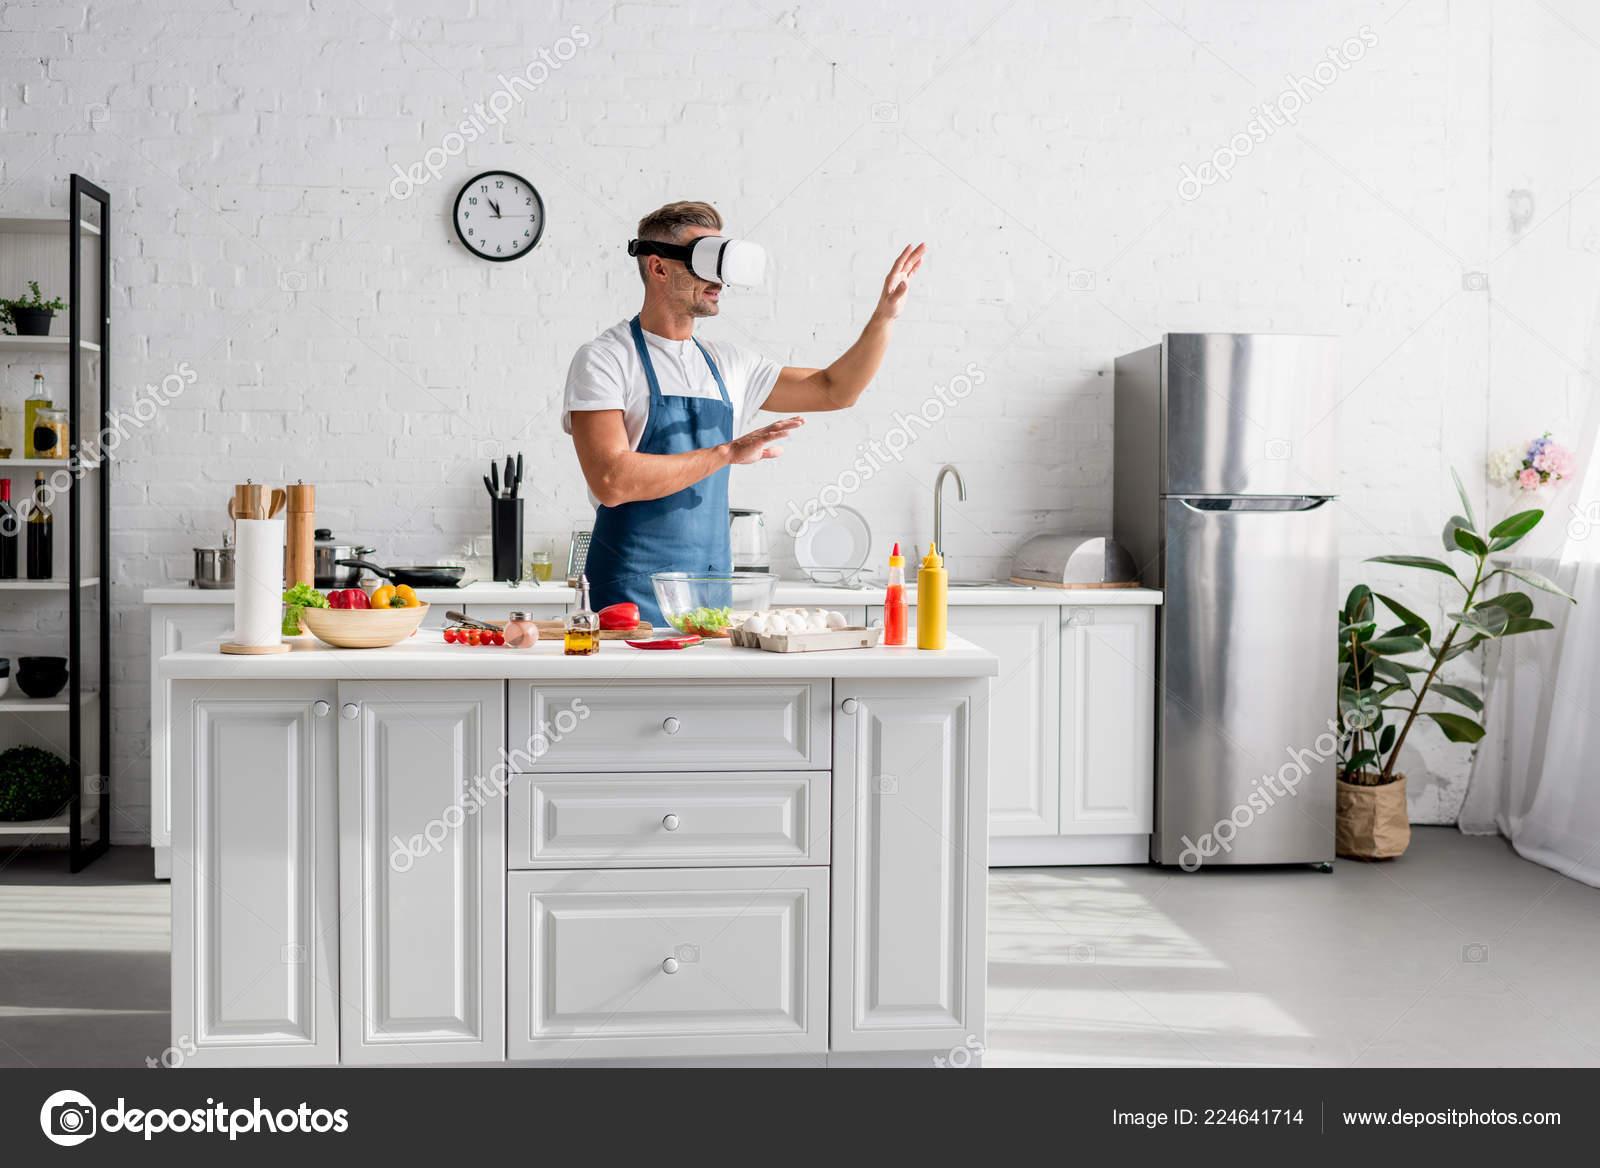 virtual kitchen modern light 成人炊具在虚拟现实耳机站在厨房 图库照片 c andrewlozovyi 224641714